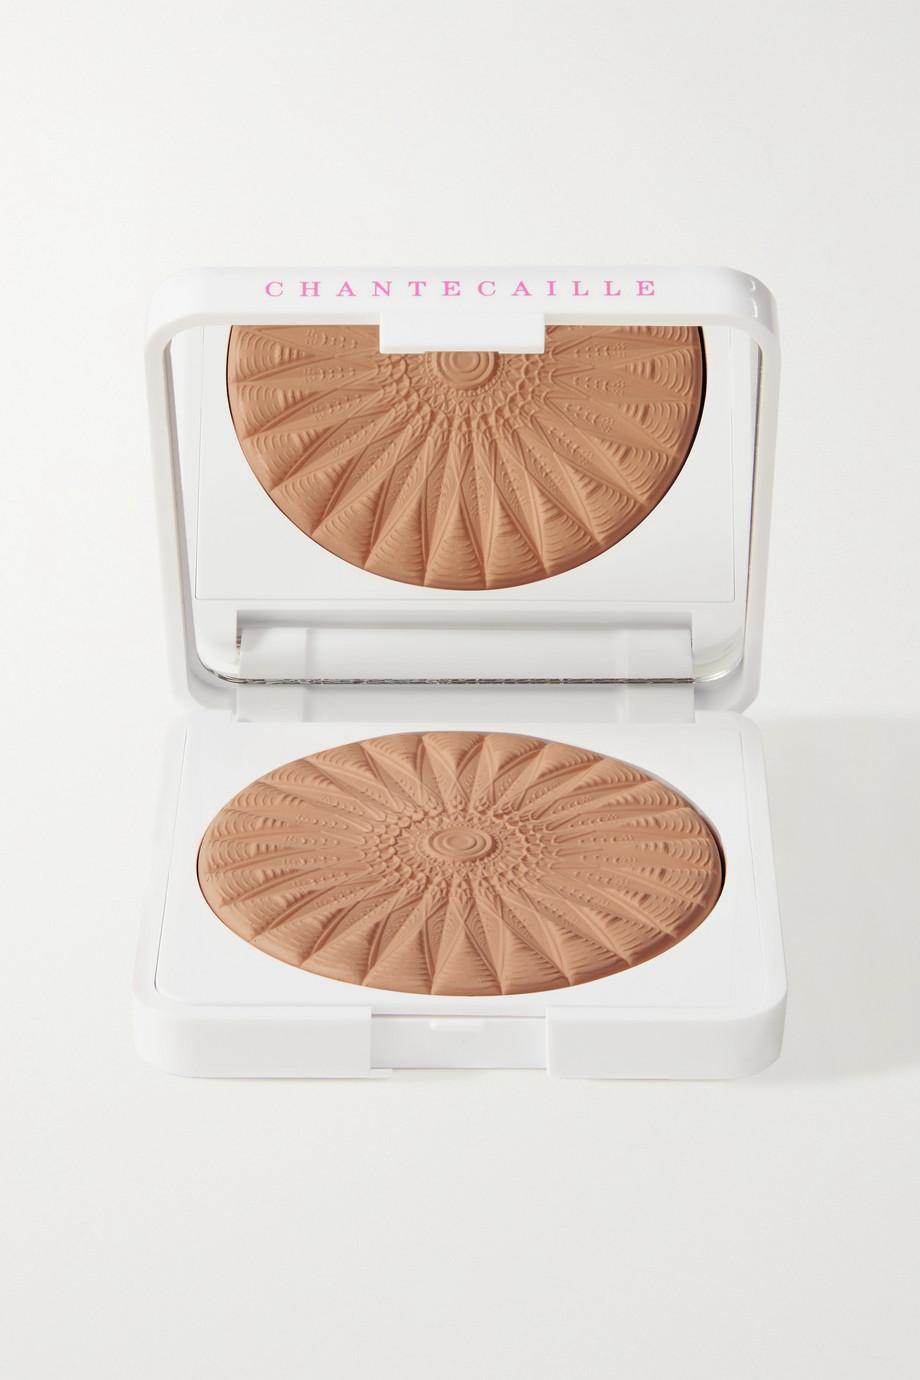 Chantecaille Perfect Blur Finishing Powder - Medium/Deep